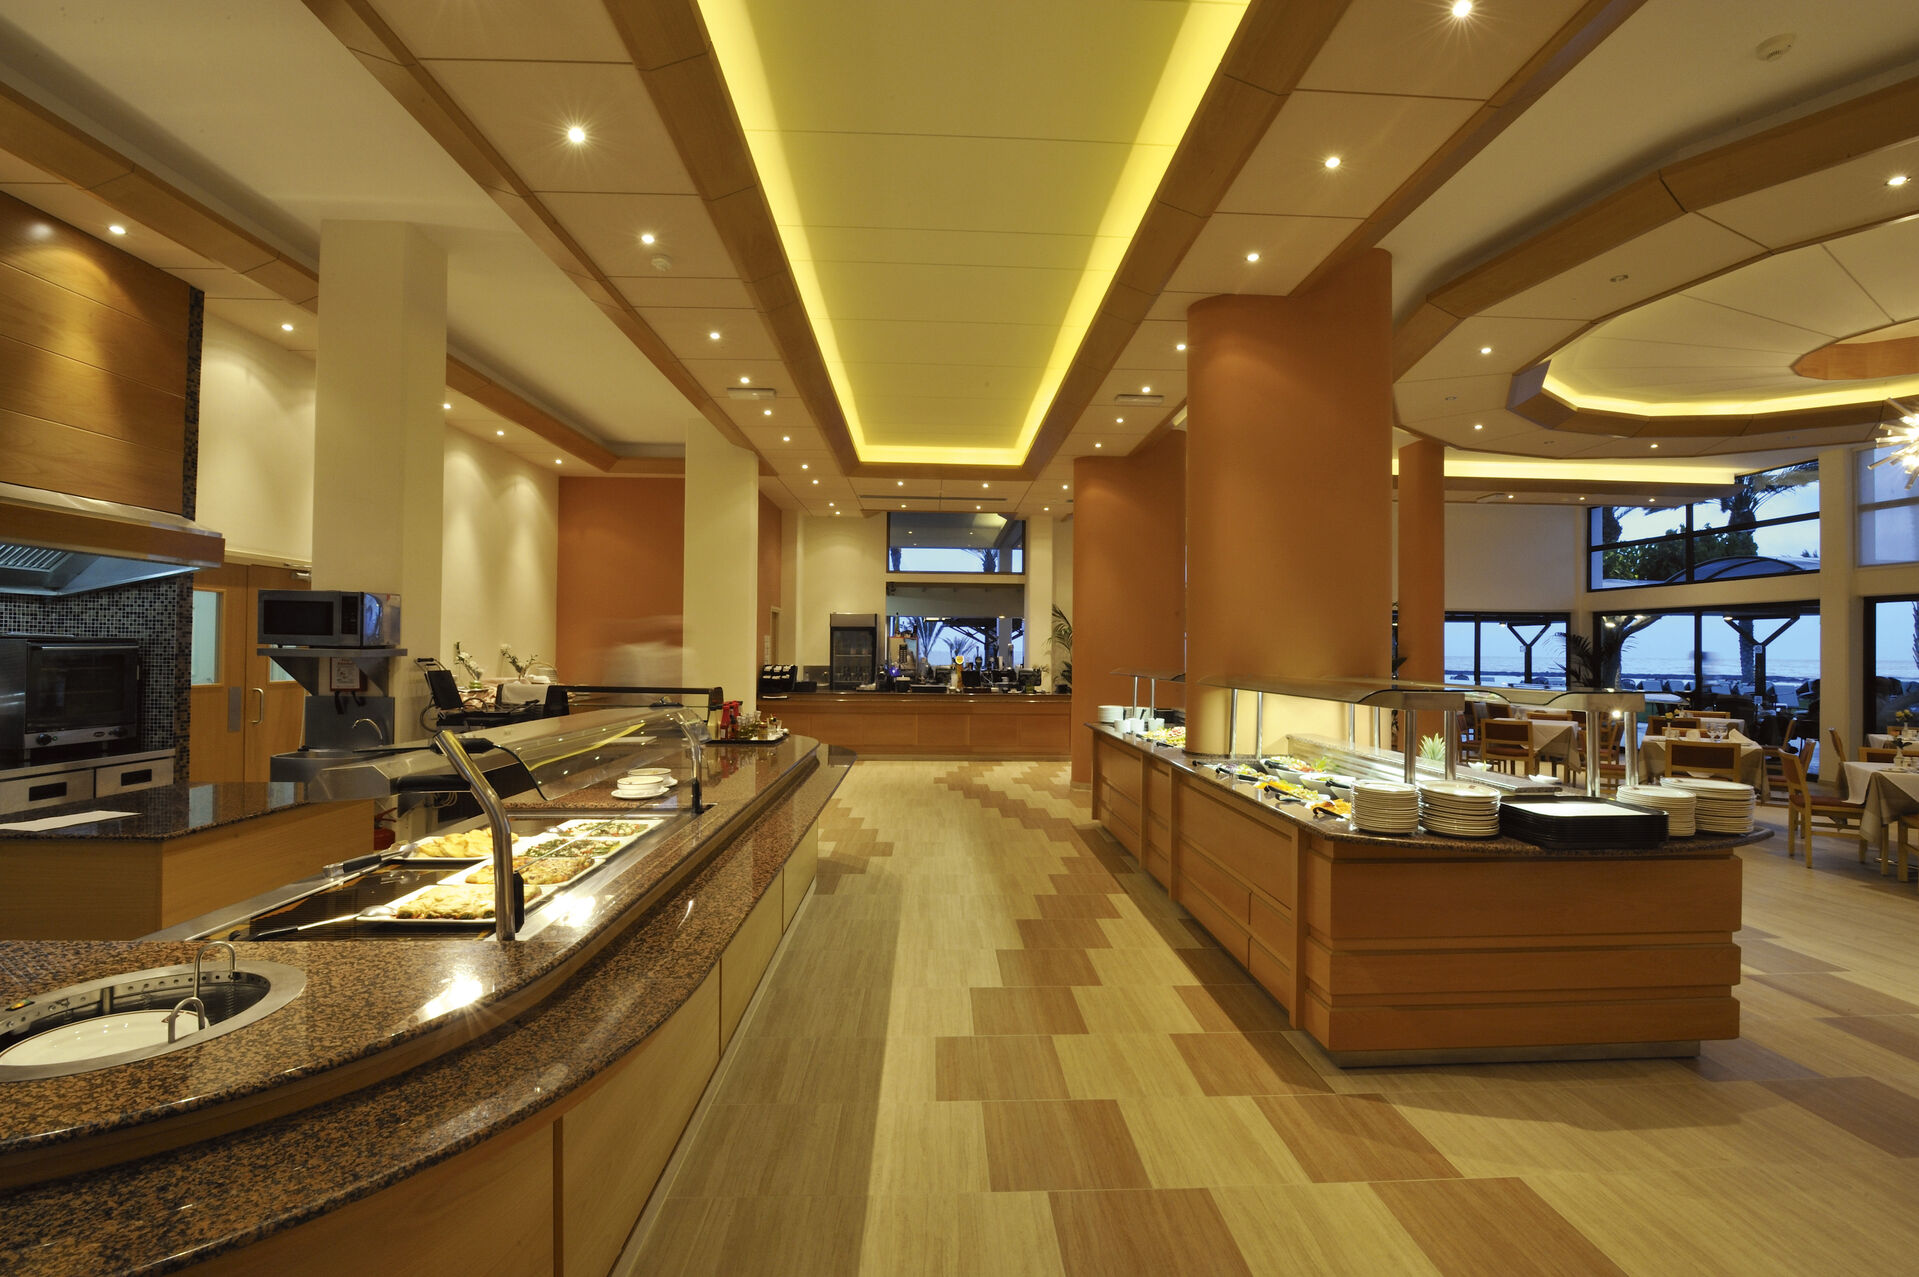 https://cms.satur.sk/data/imgs/tour_image/orig/09-pioneer-beach-hotel-regina-restaurant-1972636.jpg